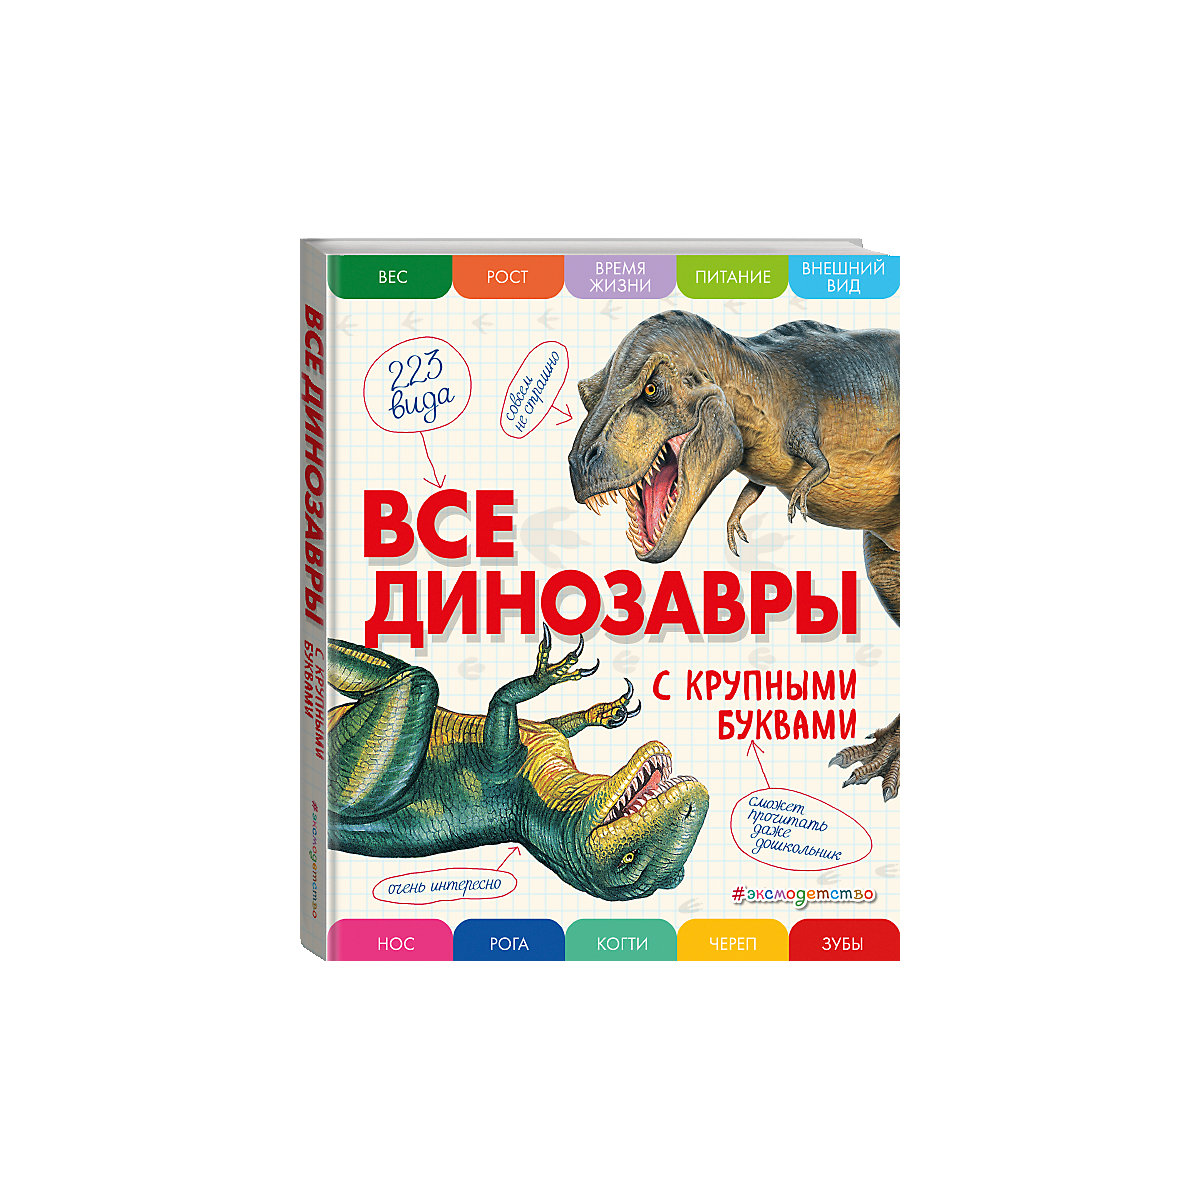 Books EKSMO 6878014 Children Education Encyclopedia Alphabet Dictionary Book For Baby MTpromo